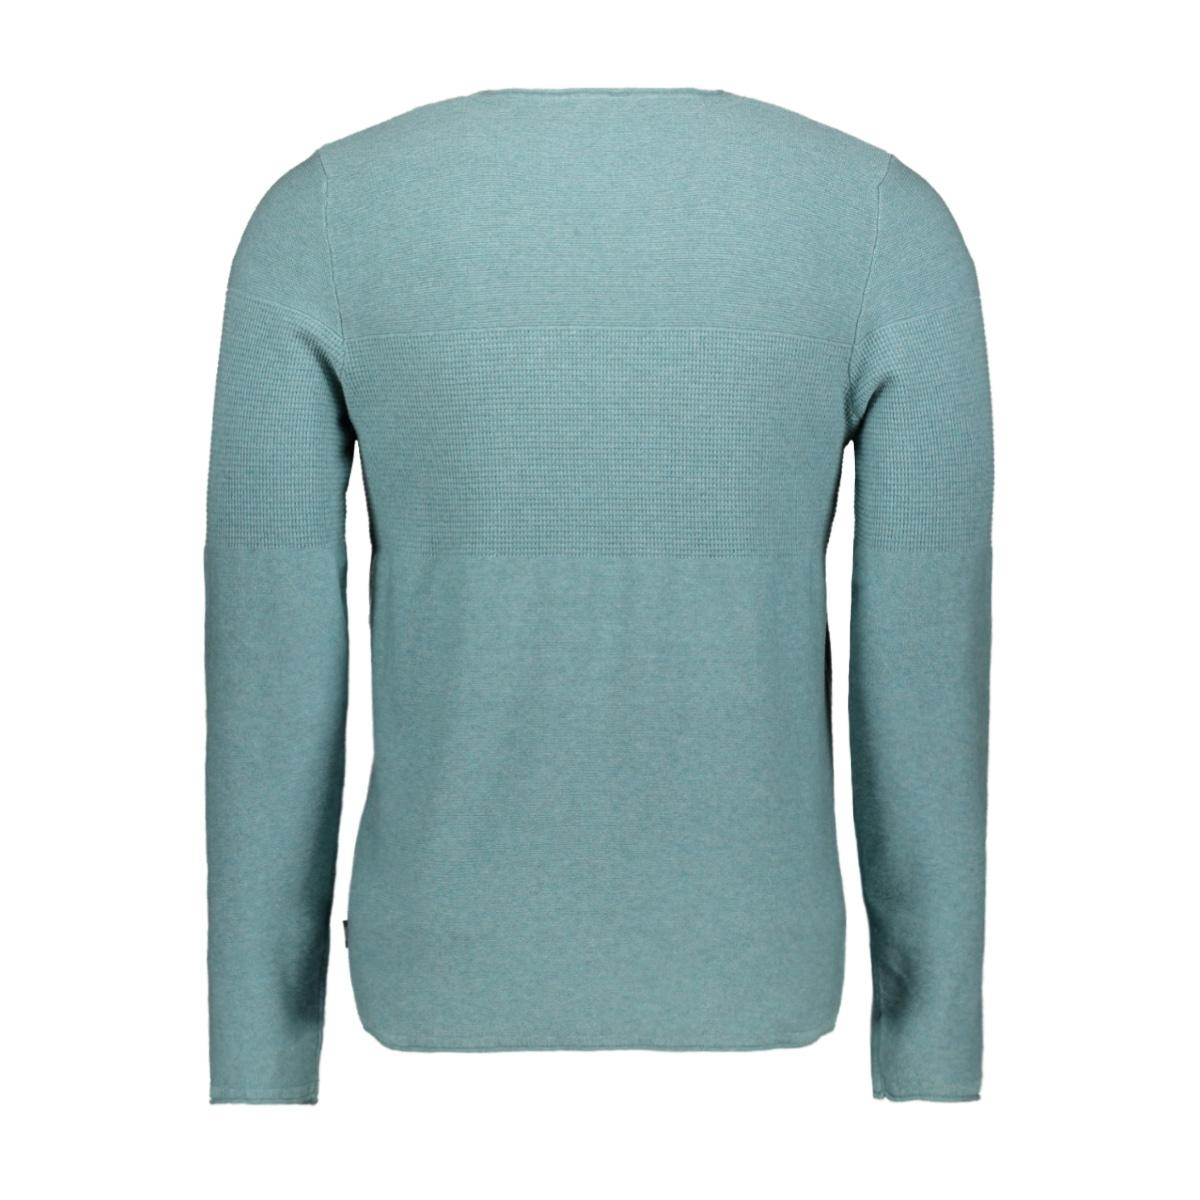 jprblamaximus knit crew organic 12168253 jack & jones trui trellis/melange